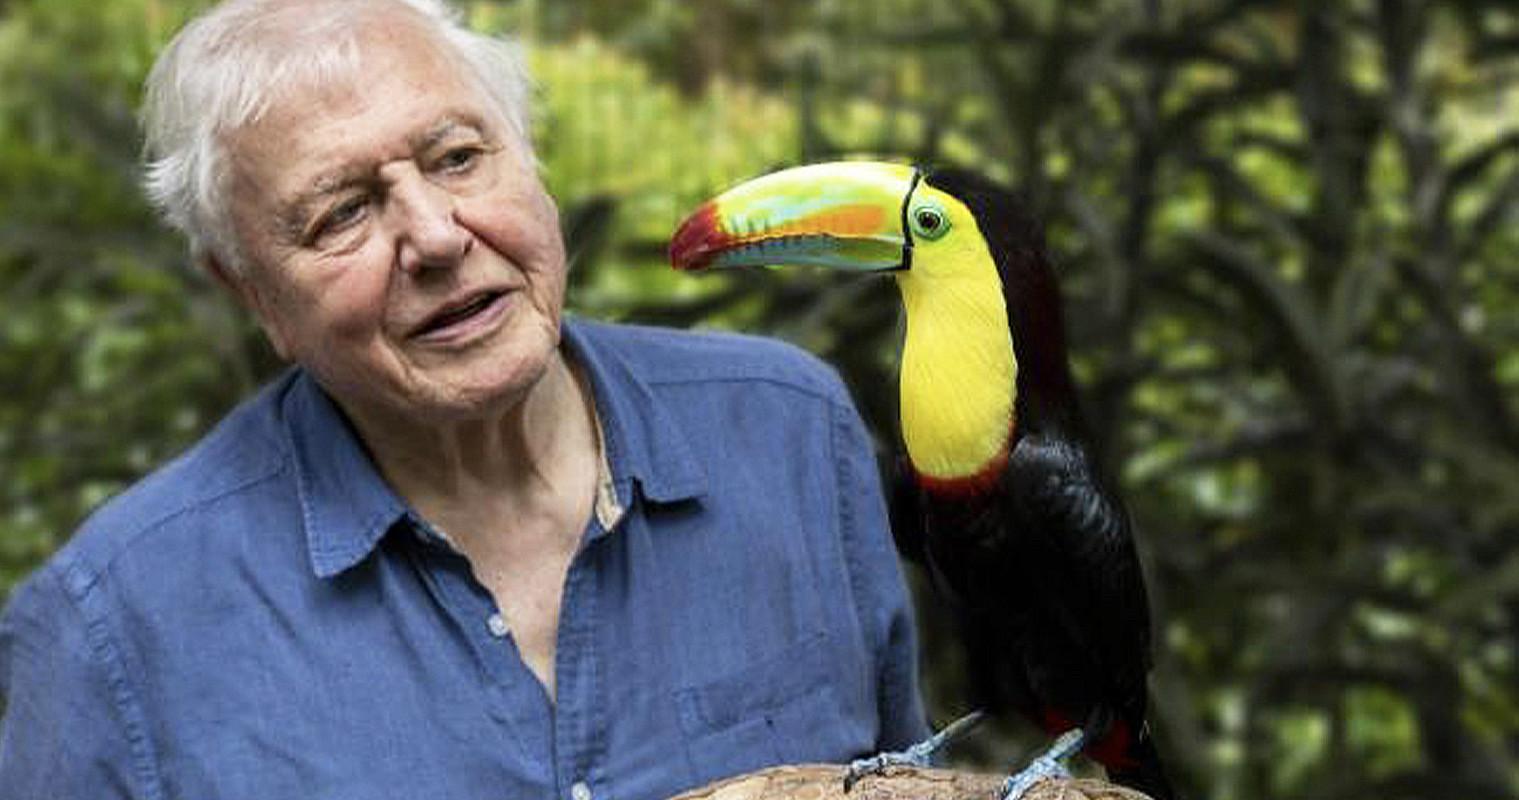 Sir David Attenborough is teaching Geography lessons on BBC Bitesize this week, The Manc